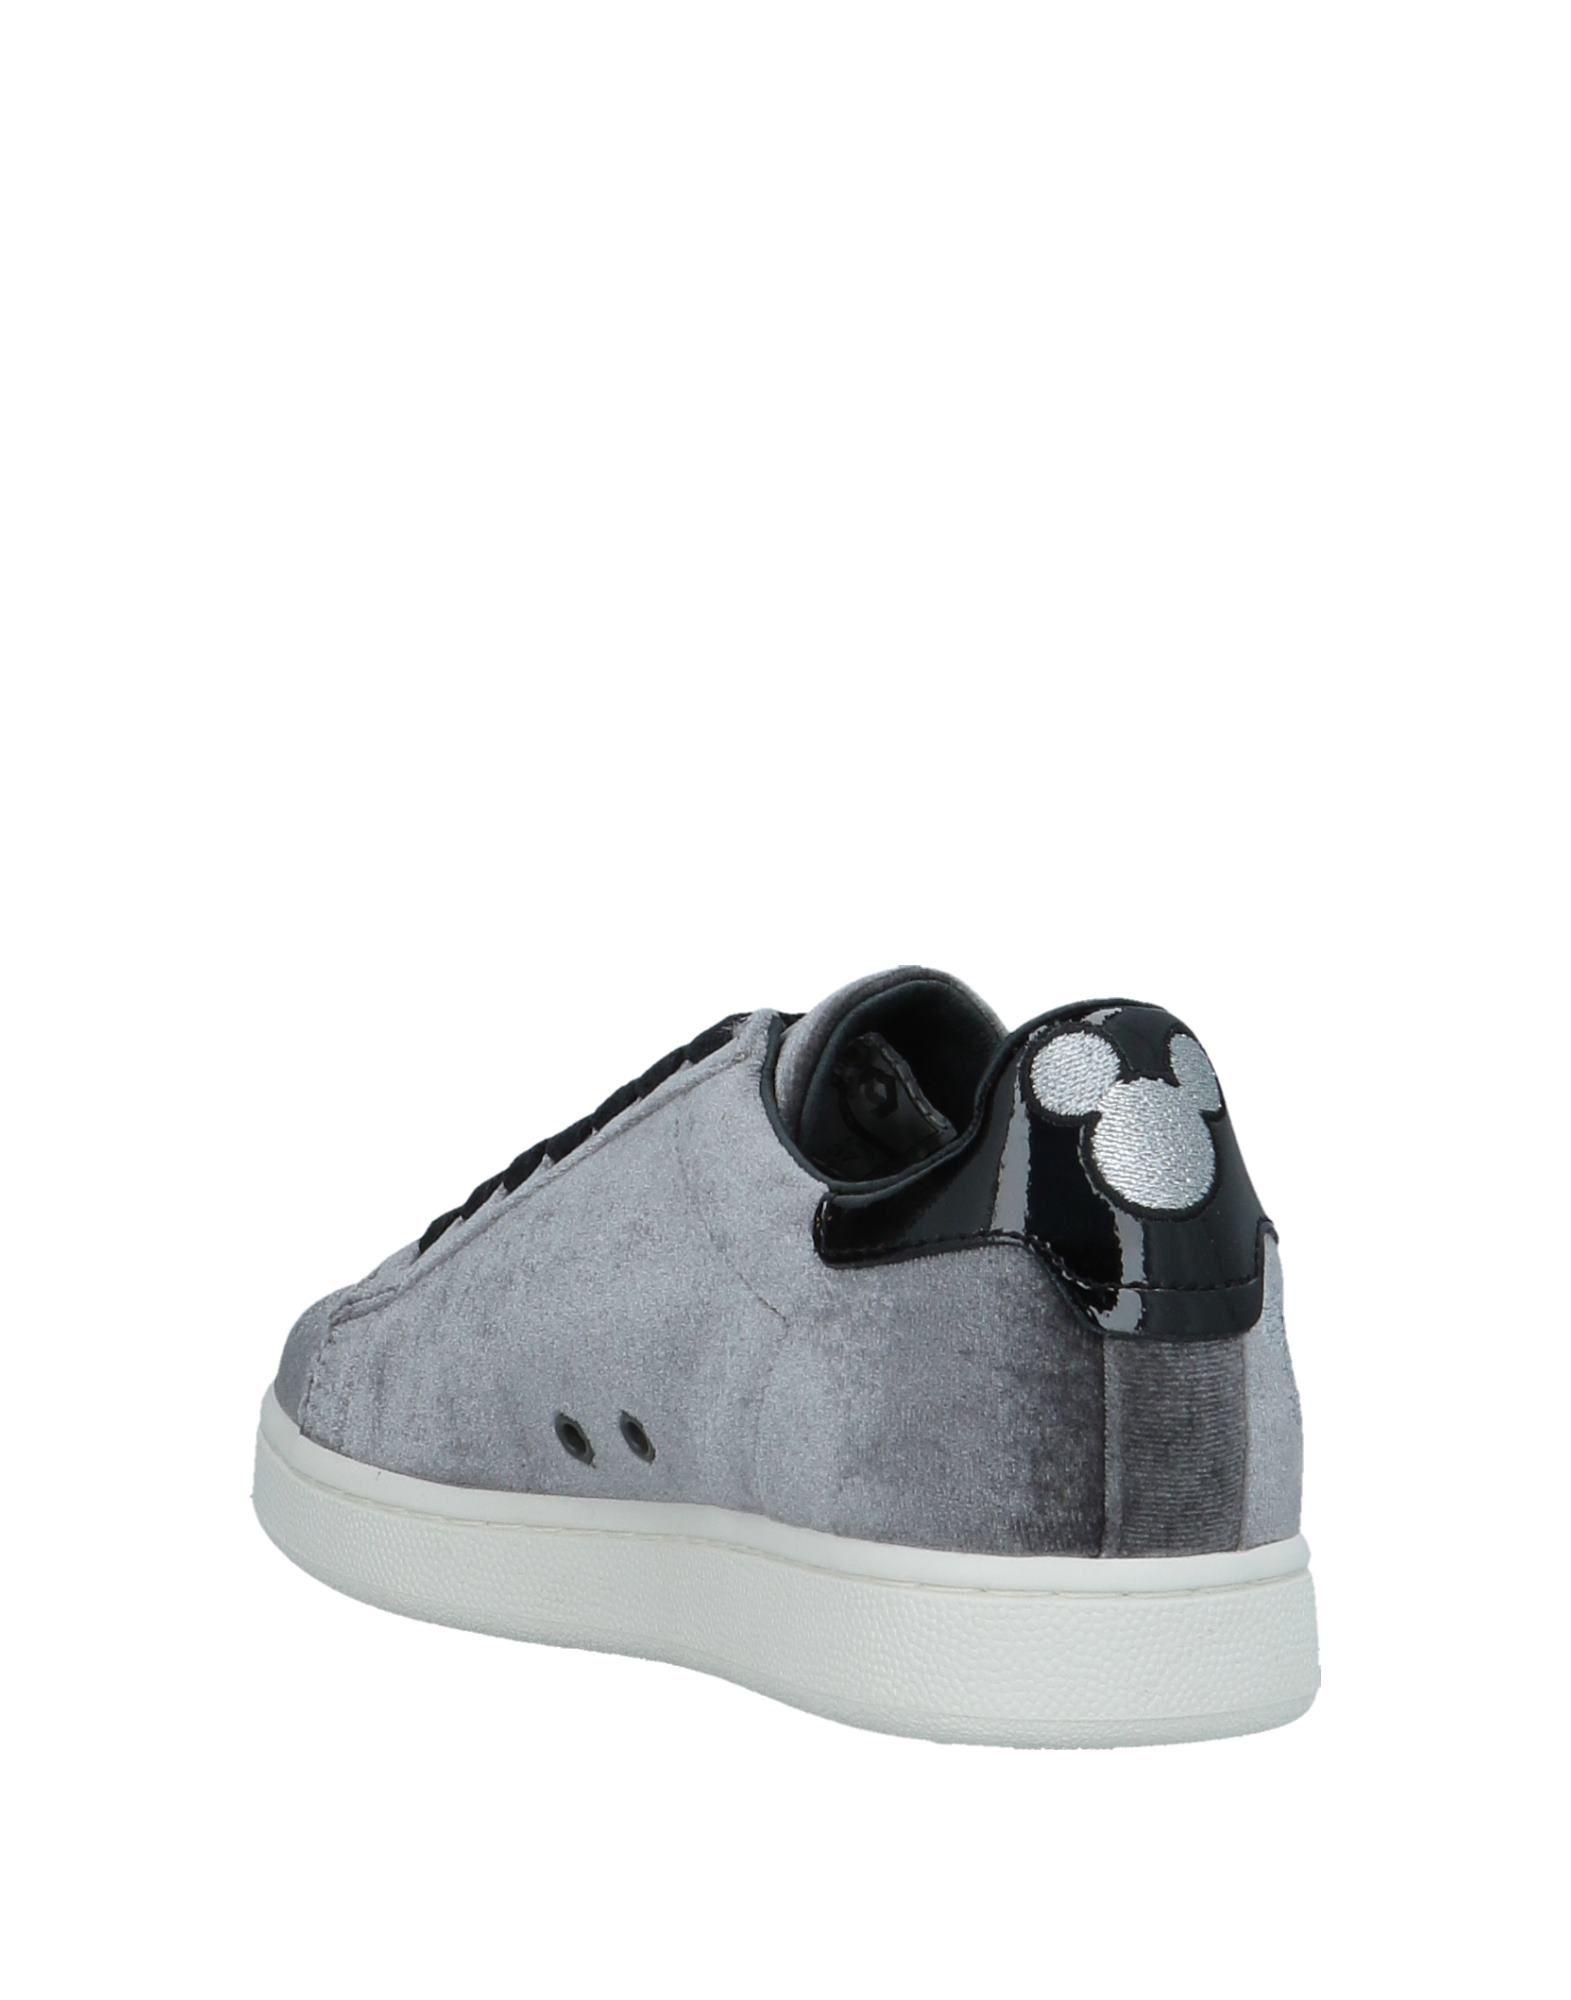 Stilvolle Of billige Schuhe Moa Master Of Stilvolle Arts Sneakers Damen  11509159FG d4df62